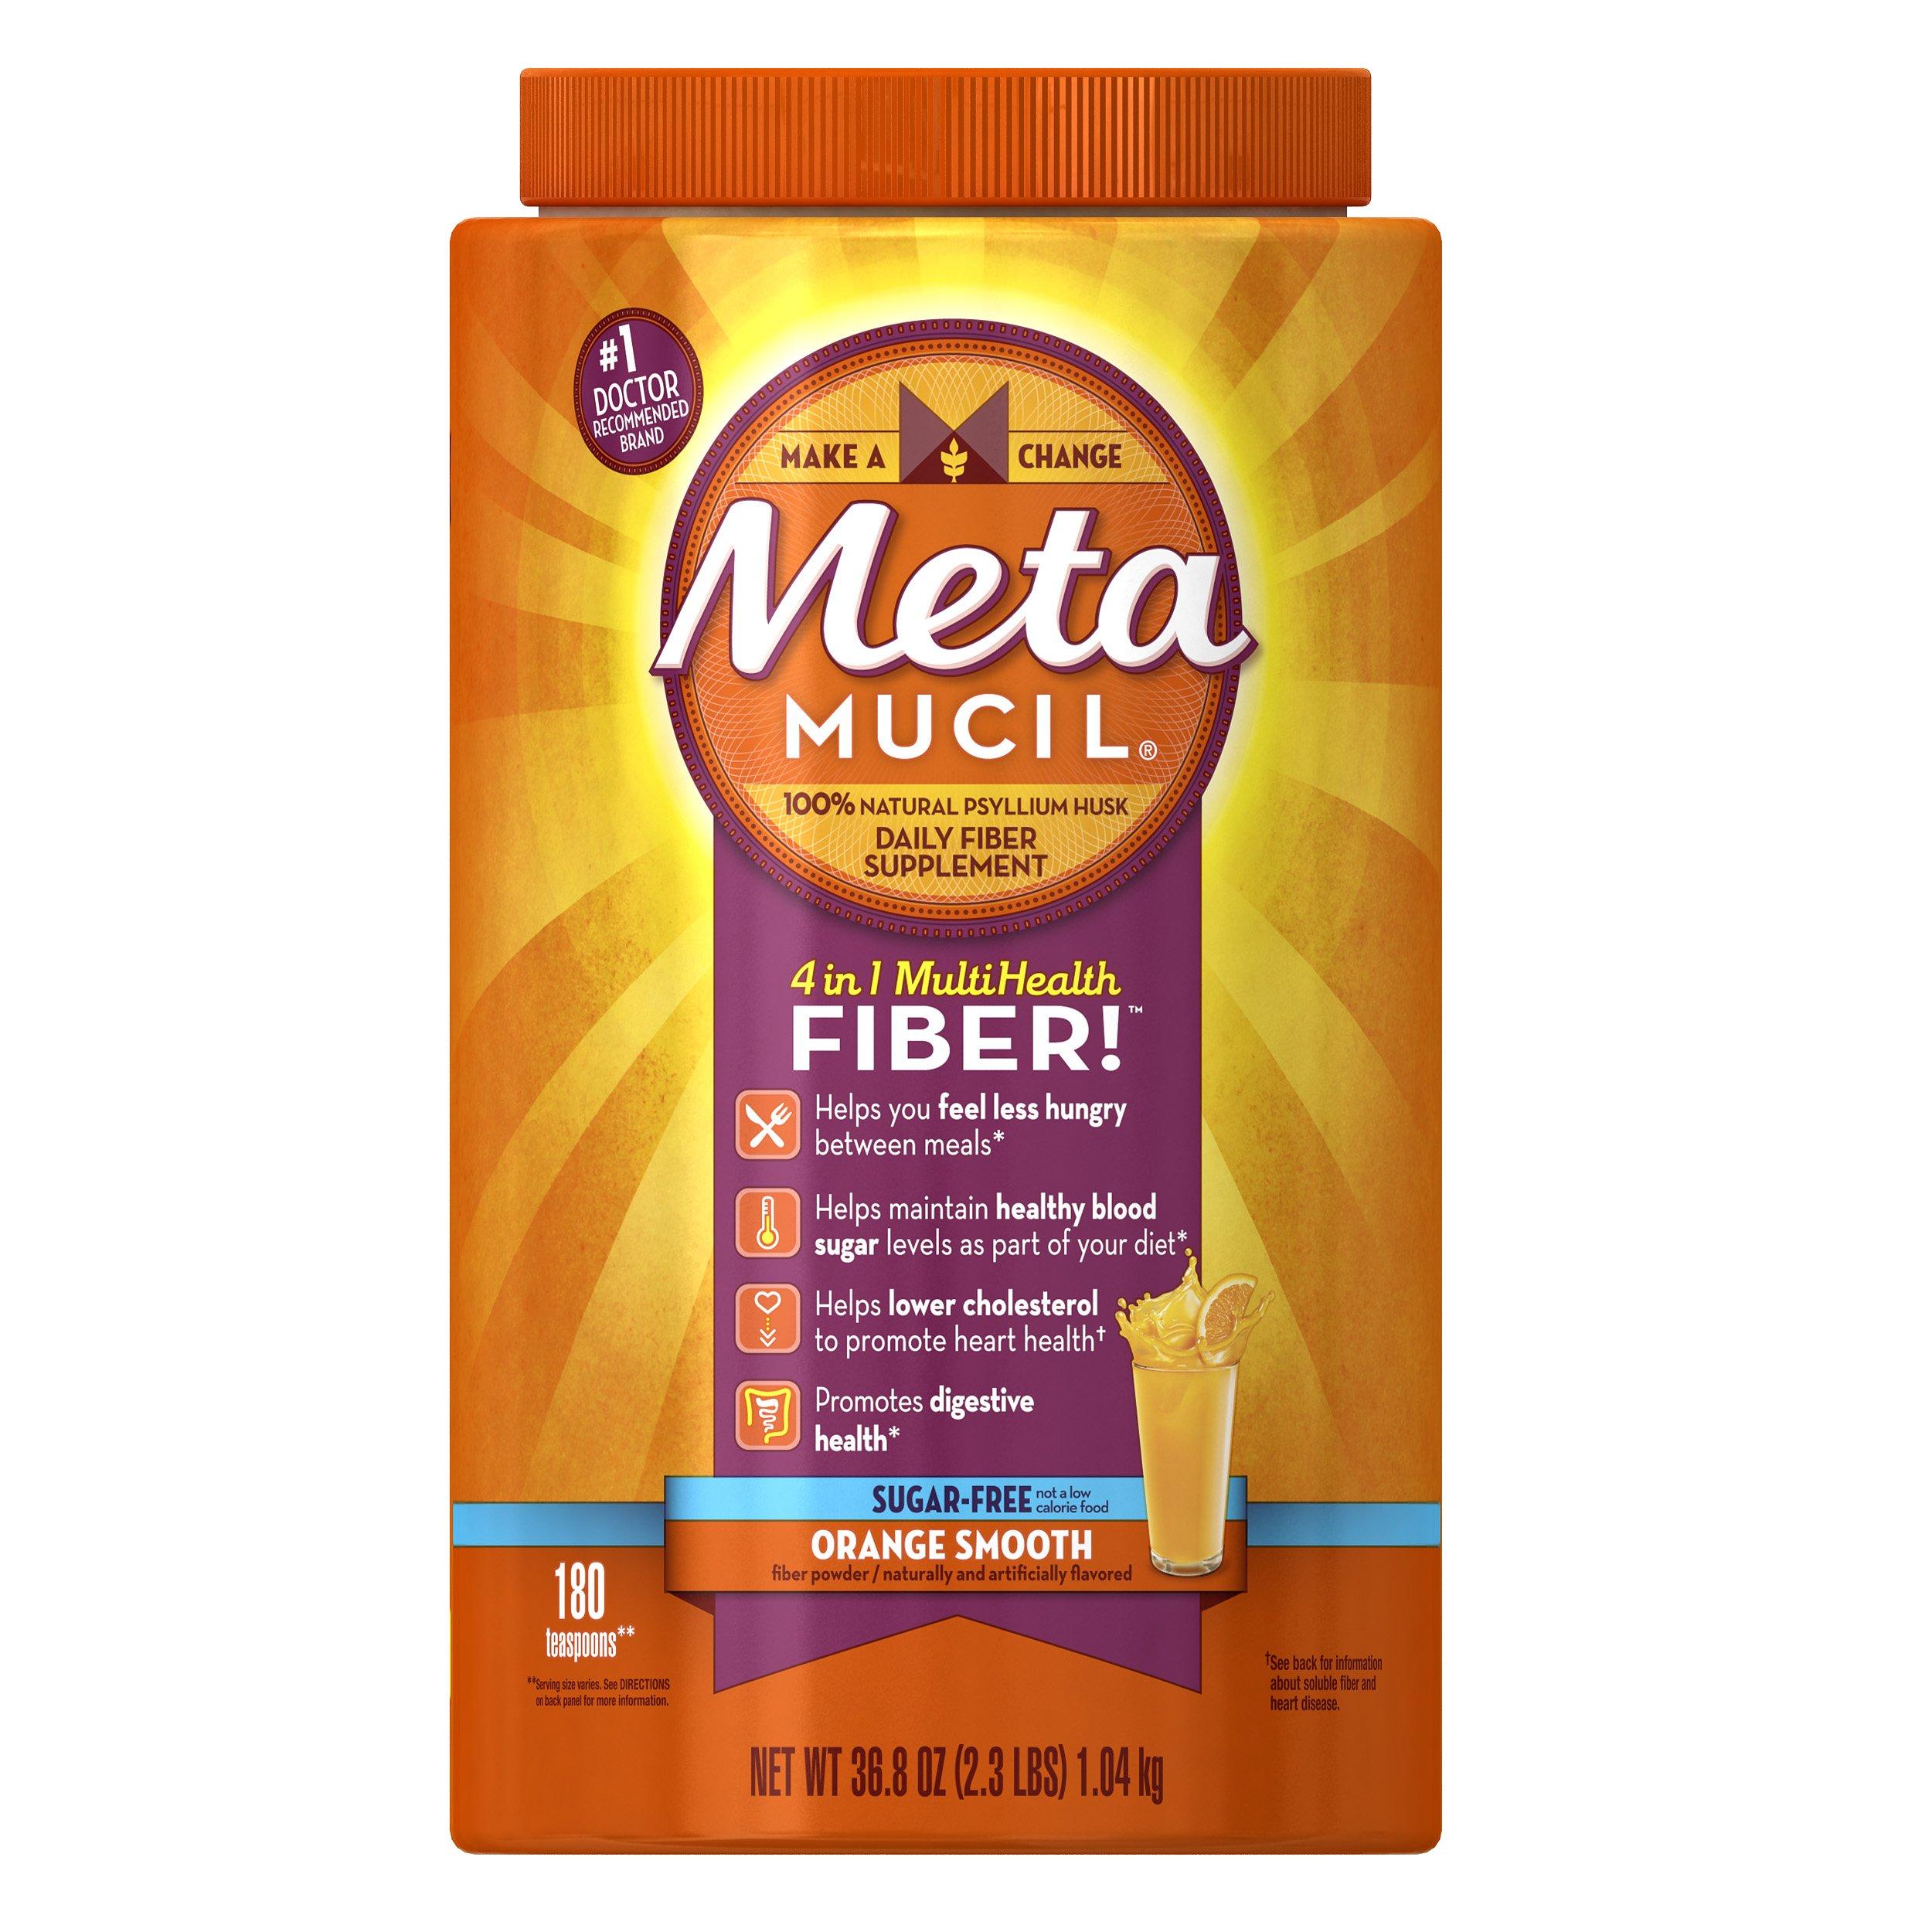 Metamucil Daily Fiber Supplement, Orange Smooth Sugar Free Psyllium Husk Fiber Powder, 180 Doses